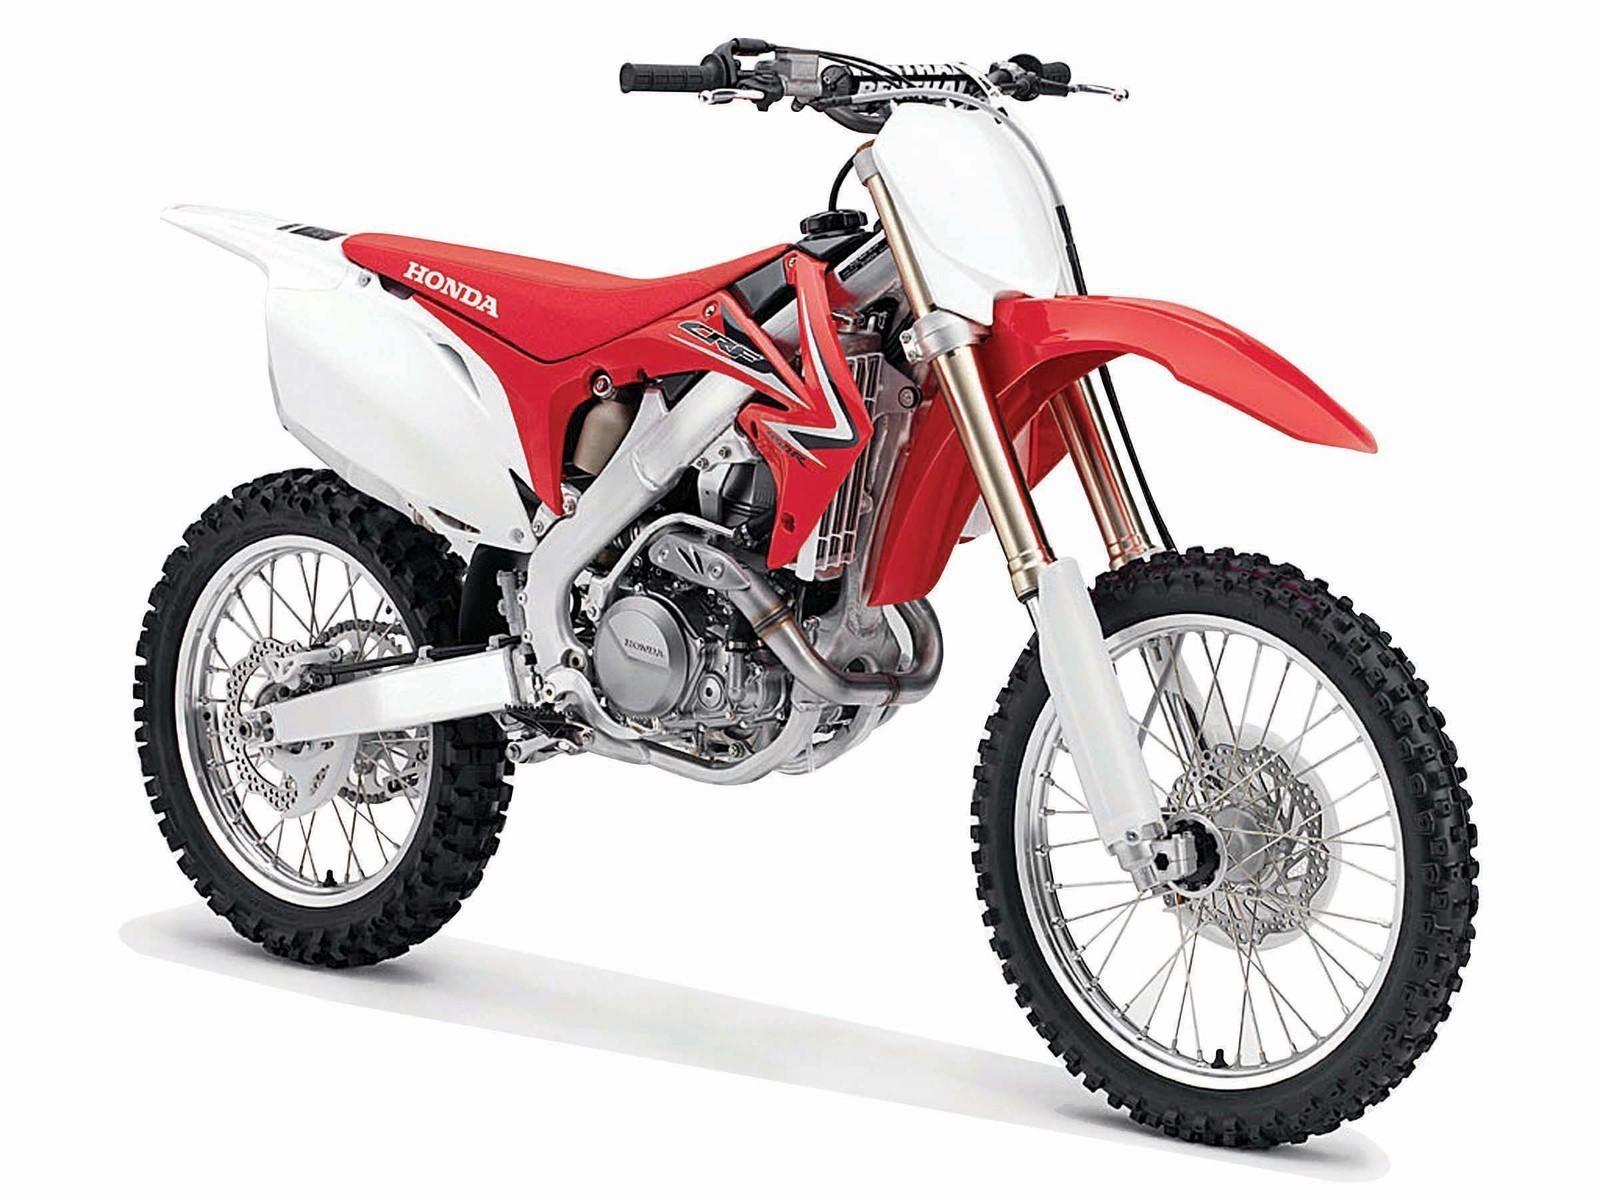 Honda Dirt Bike Manual Data Wiring Diagrams 50cc Motorcycle Rh Bikersmild Blogspot Com 100